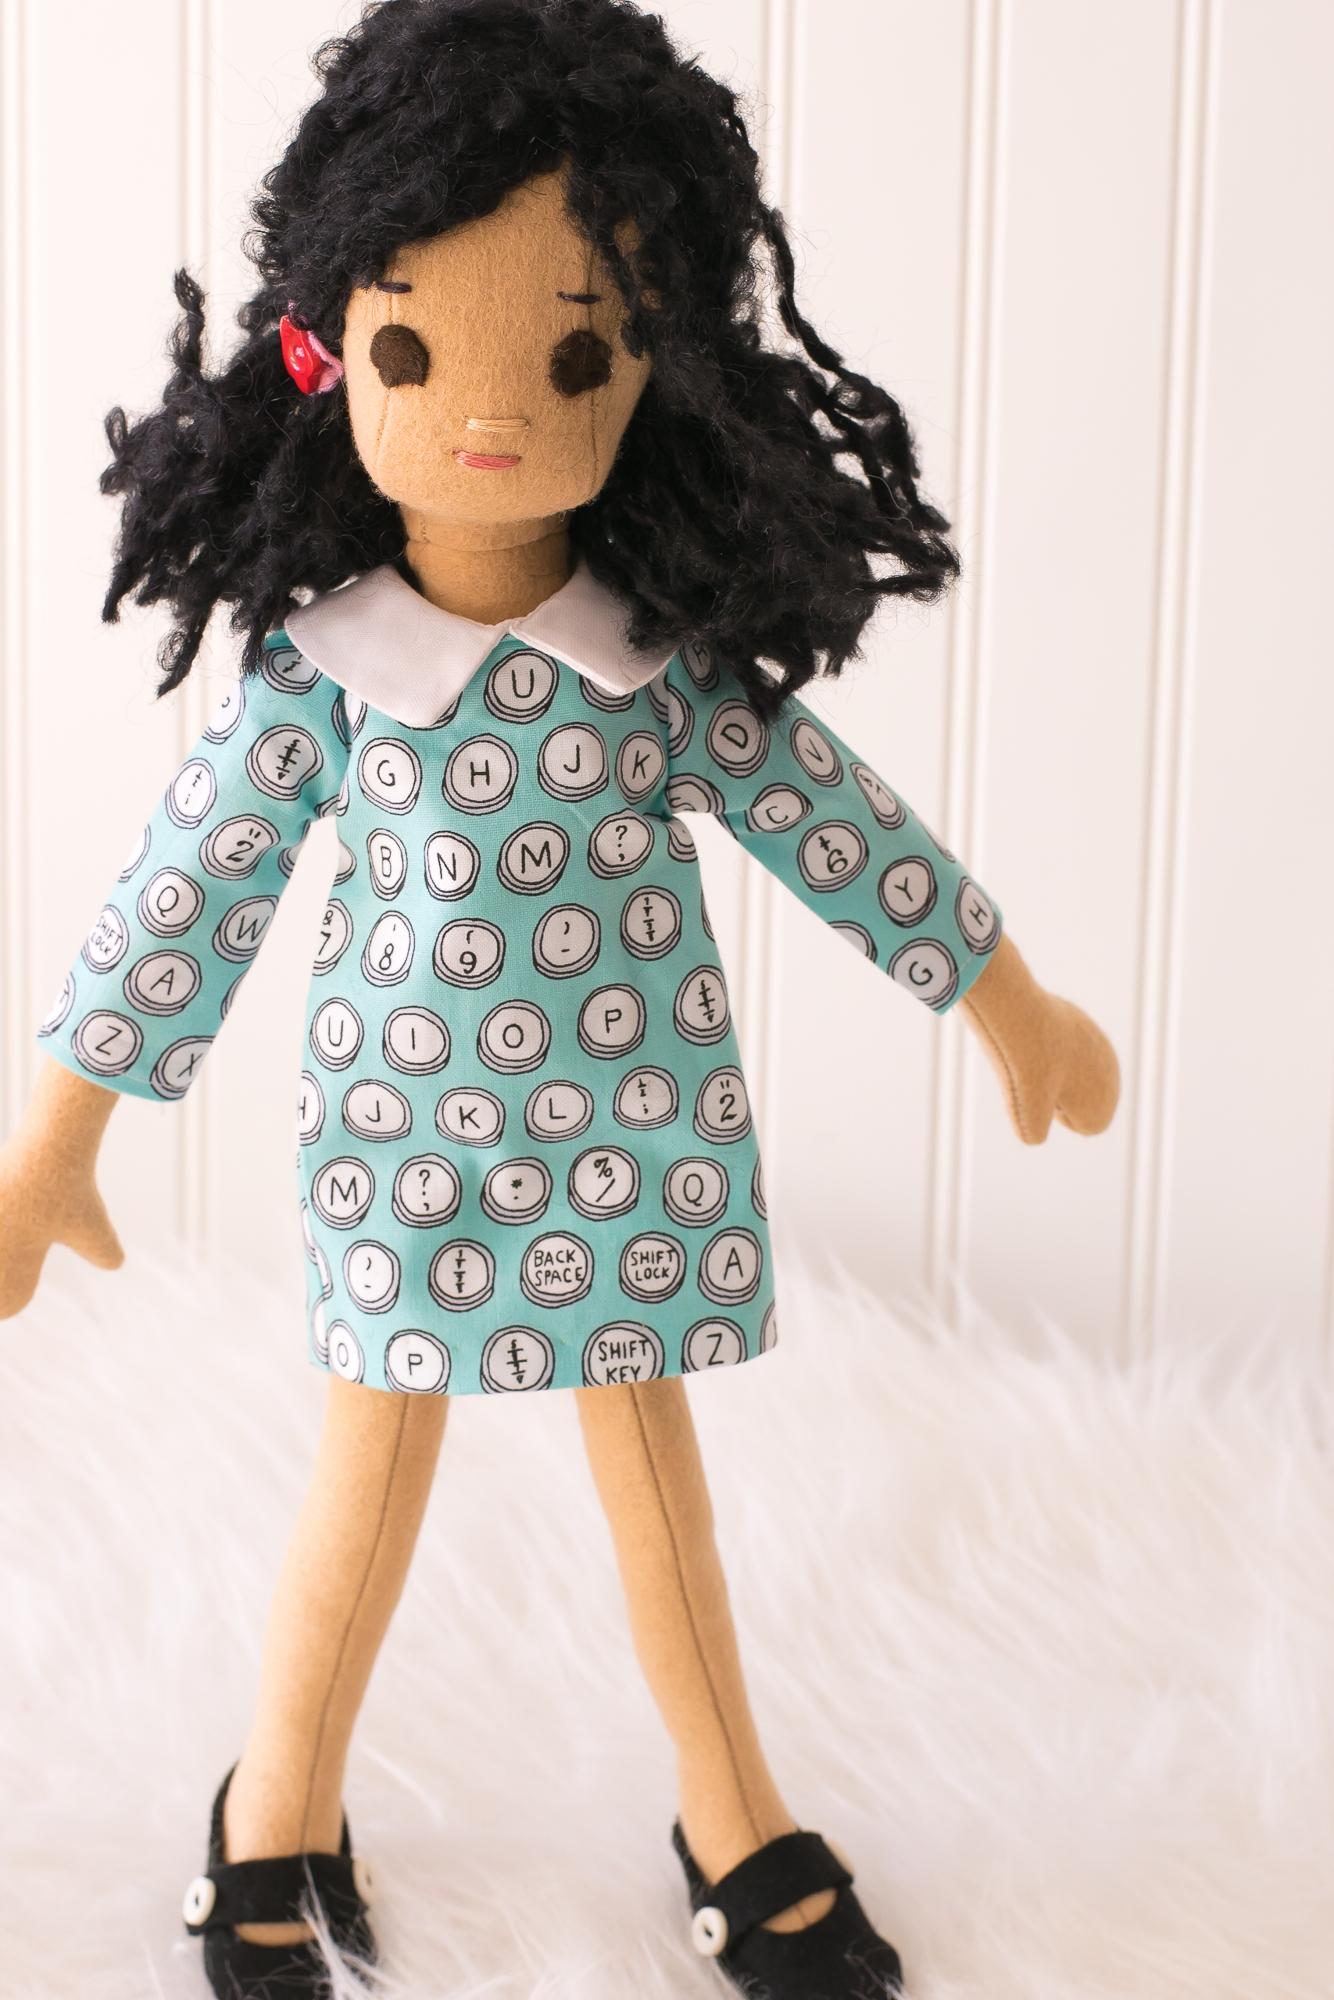 Gallery of Dolls-8.jpg